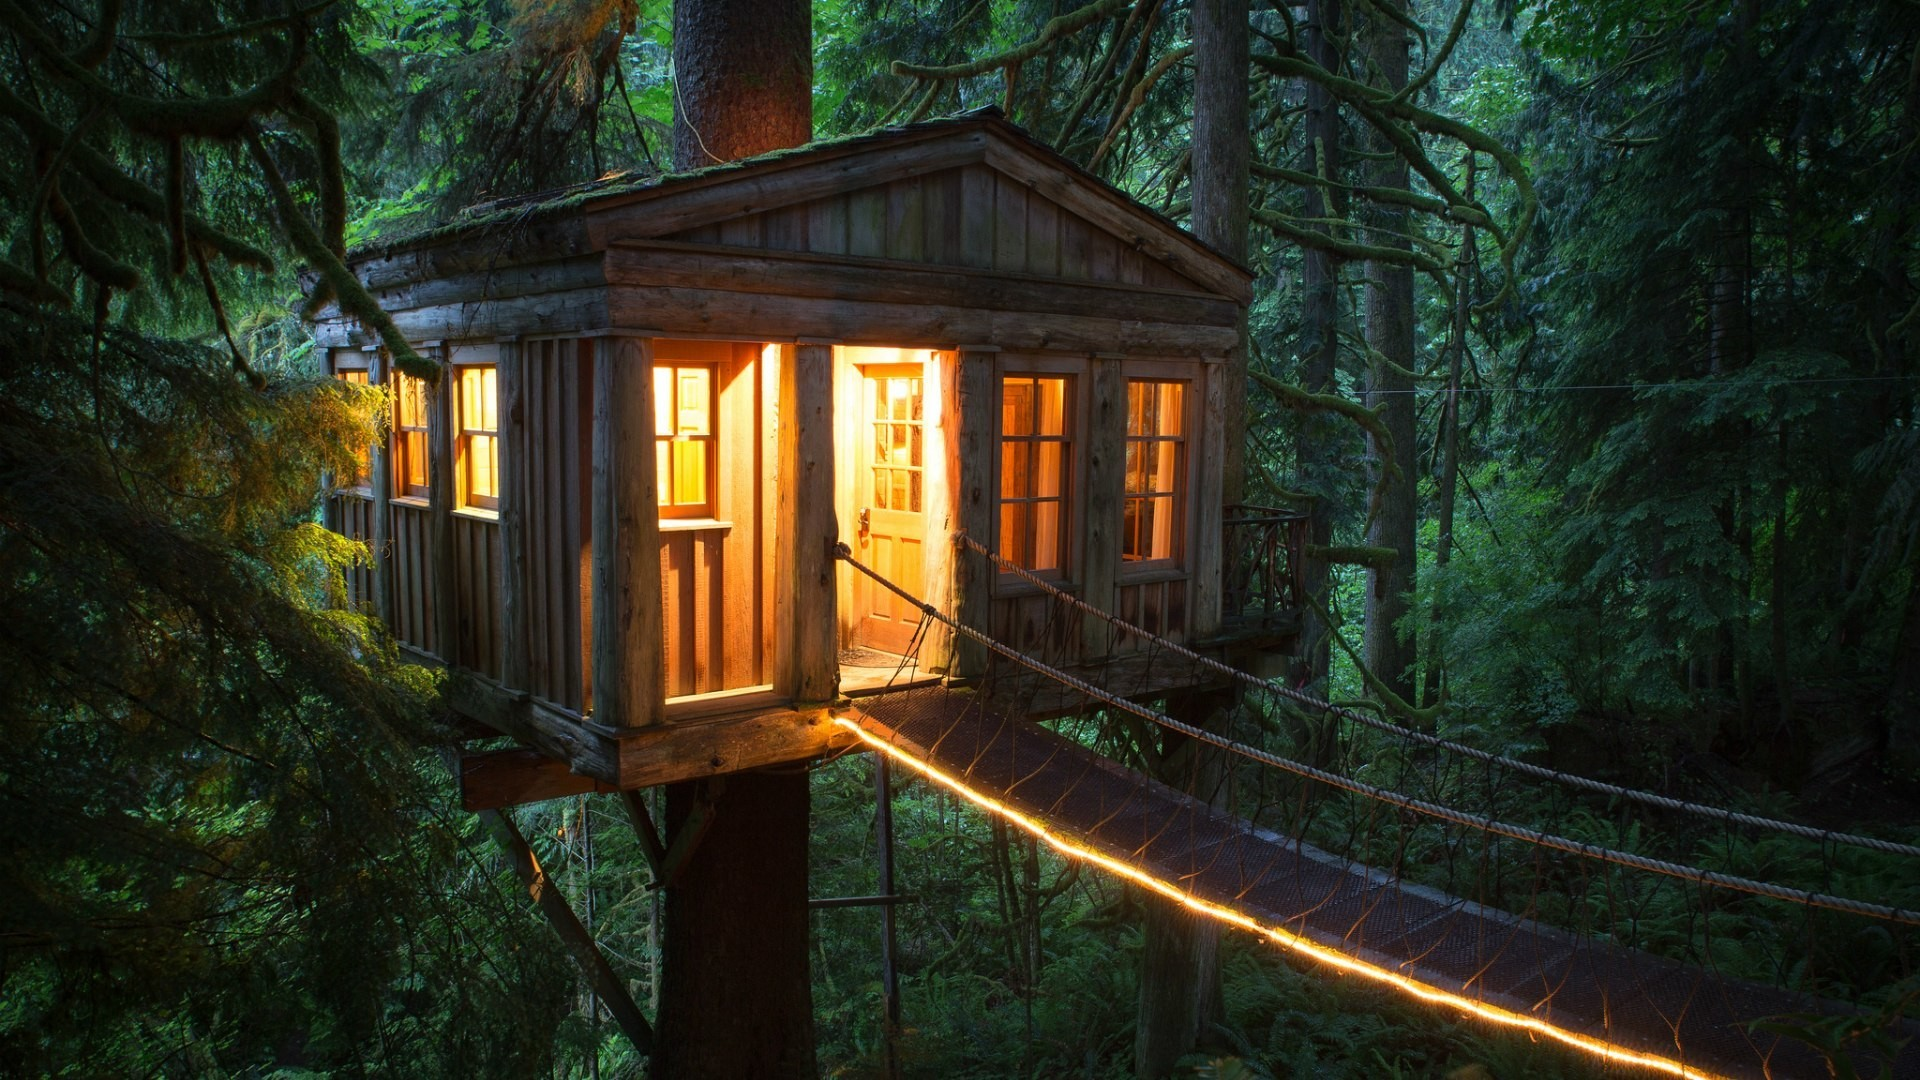 A Frame Home Floor Plans والپیپر کلبه چوبی پس زمینه دانلود جدیدترین والپیپرها